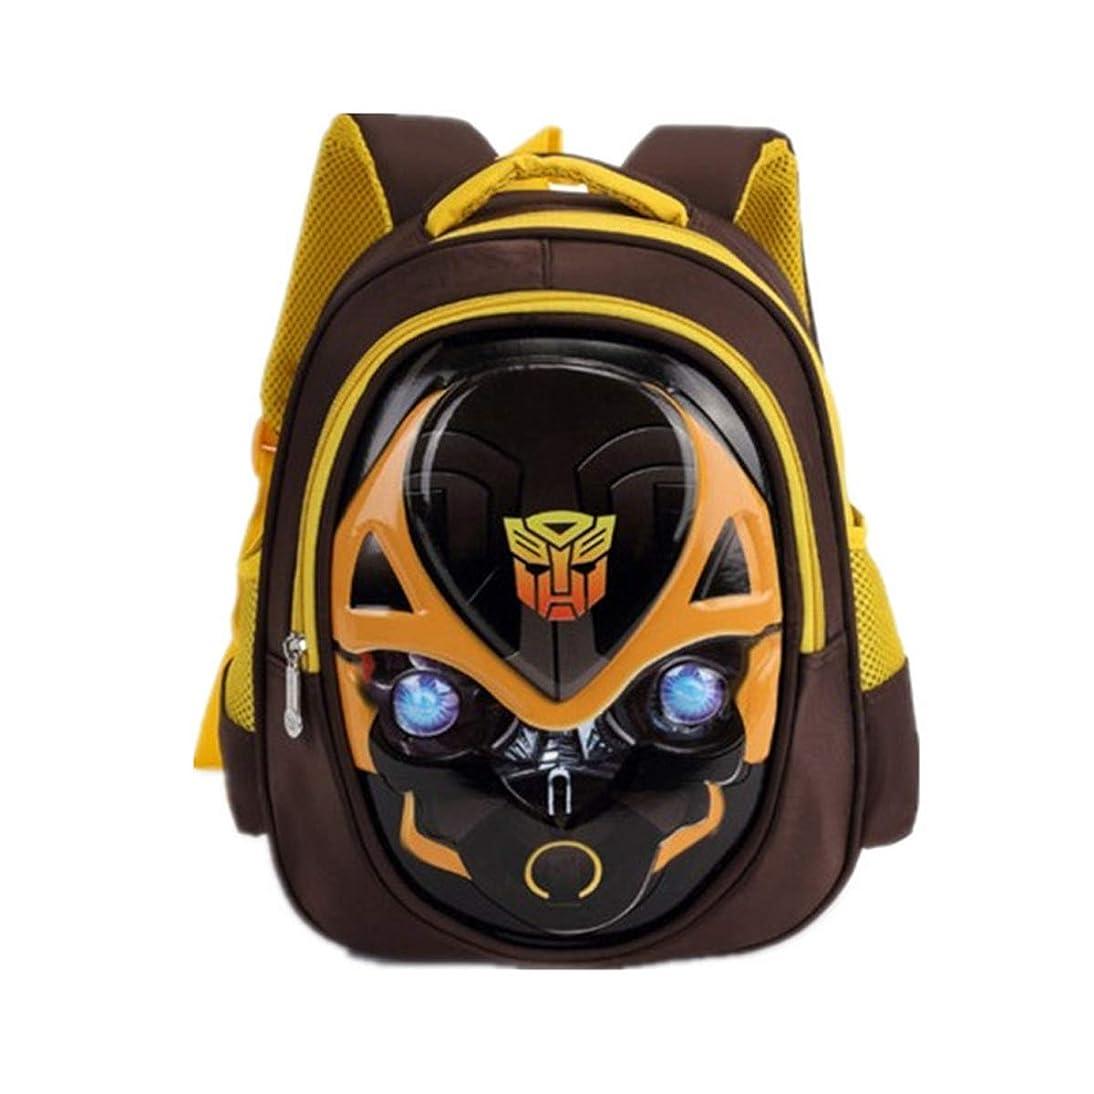 Bumblebee Transformers Captain America Children's School Backpack Teens Backpacks For Boys And Girls School Bags,Bumblebee-302612cm vlnl248815893775